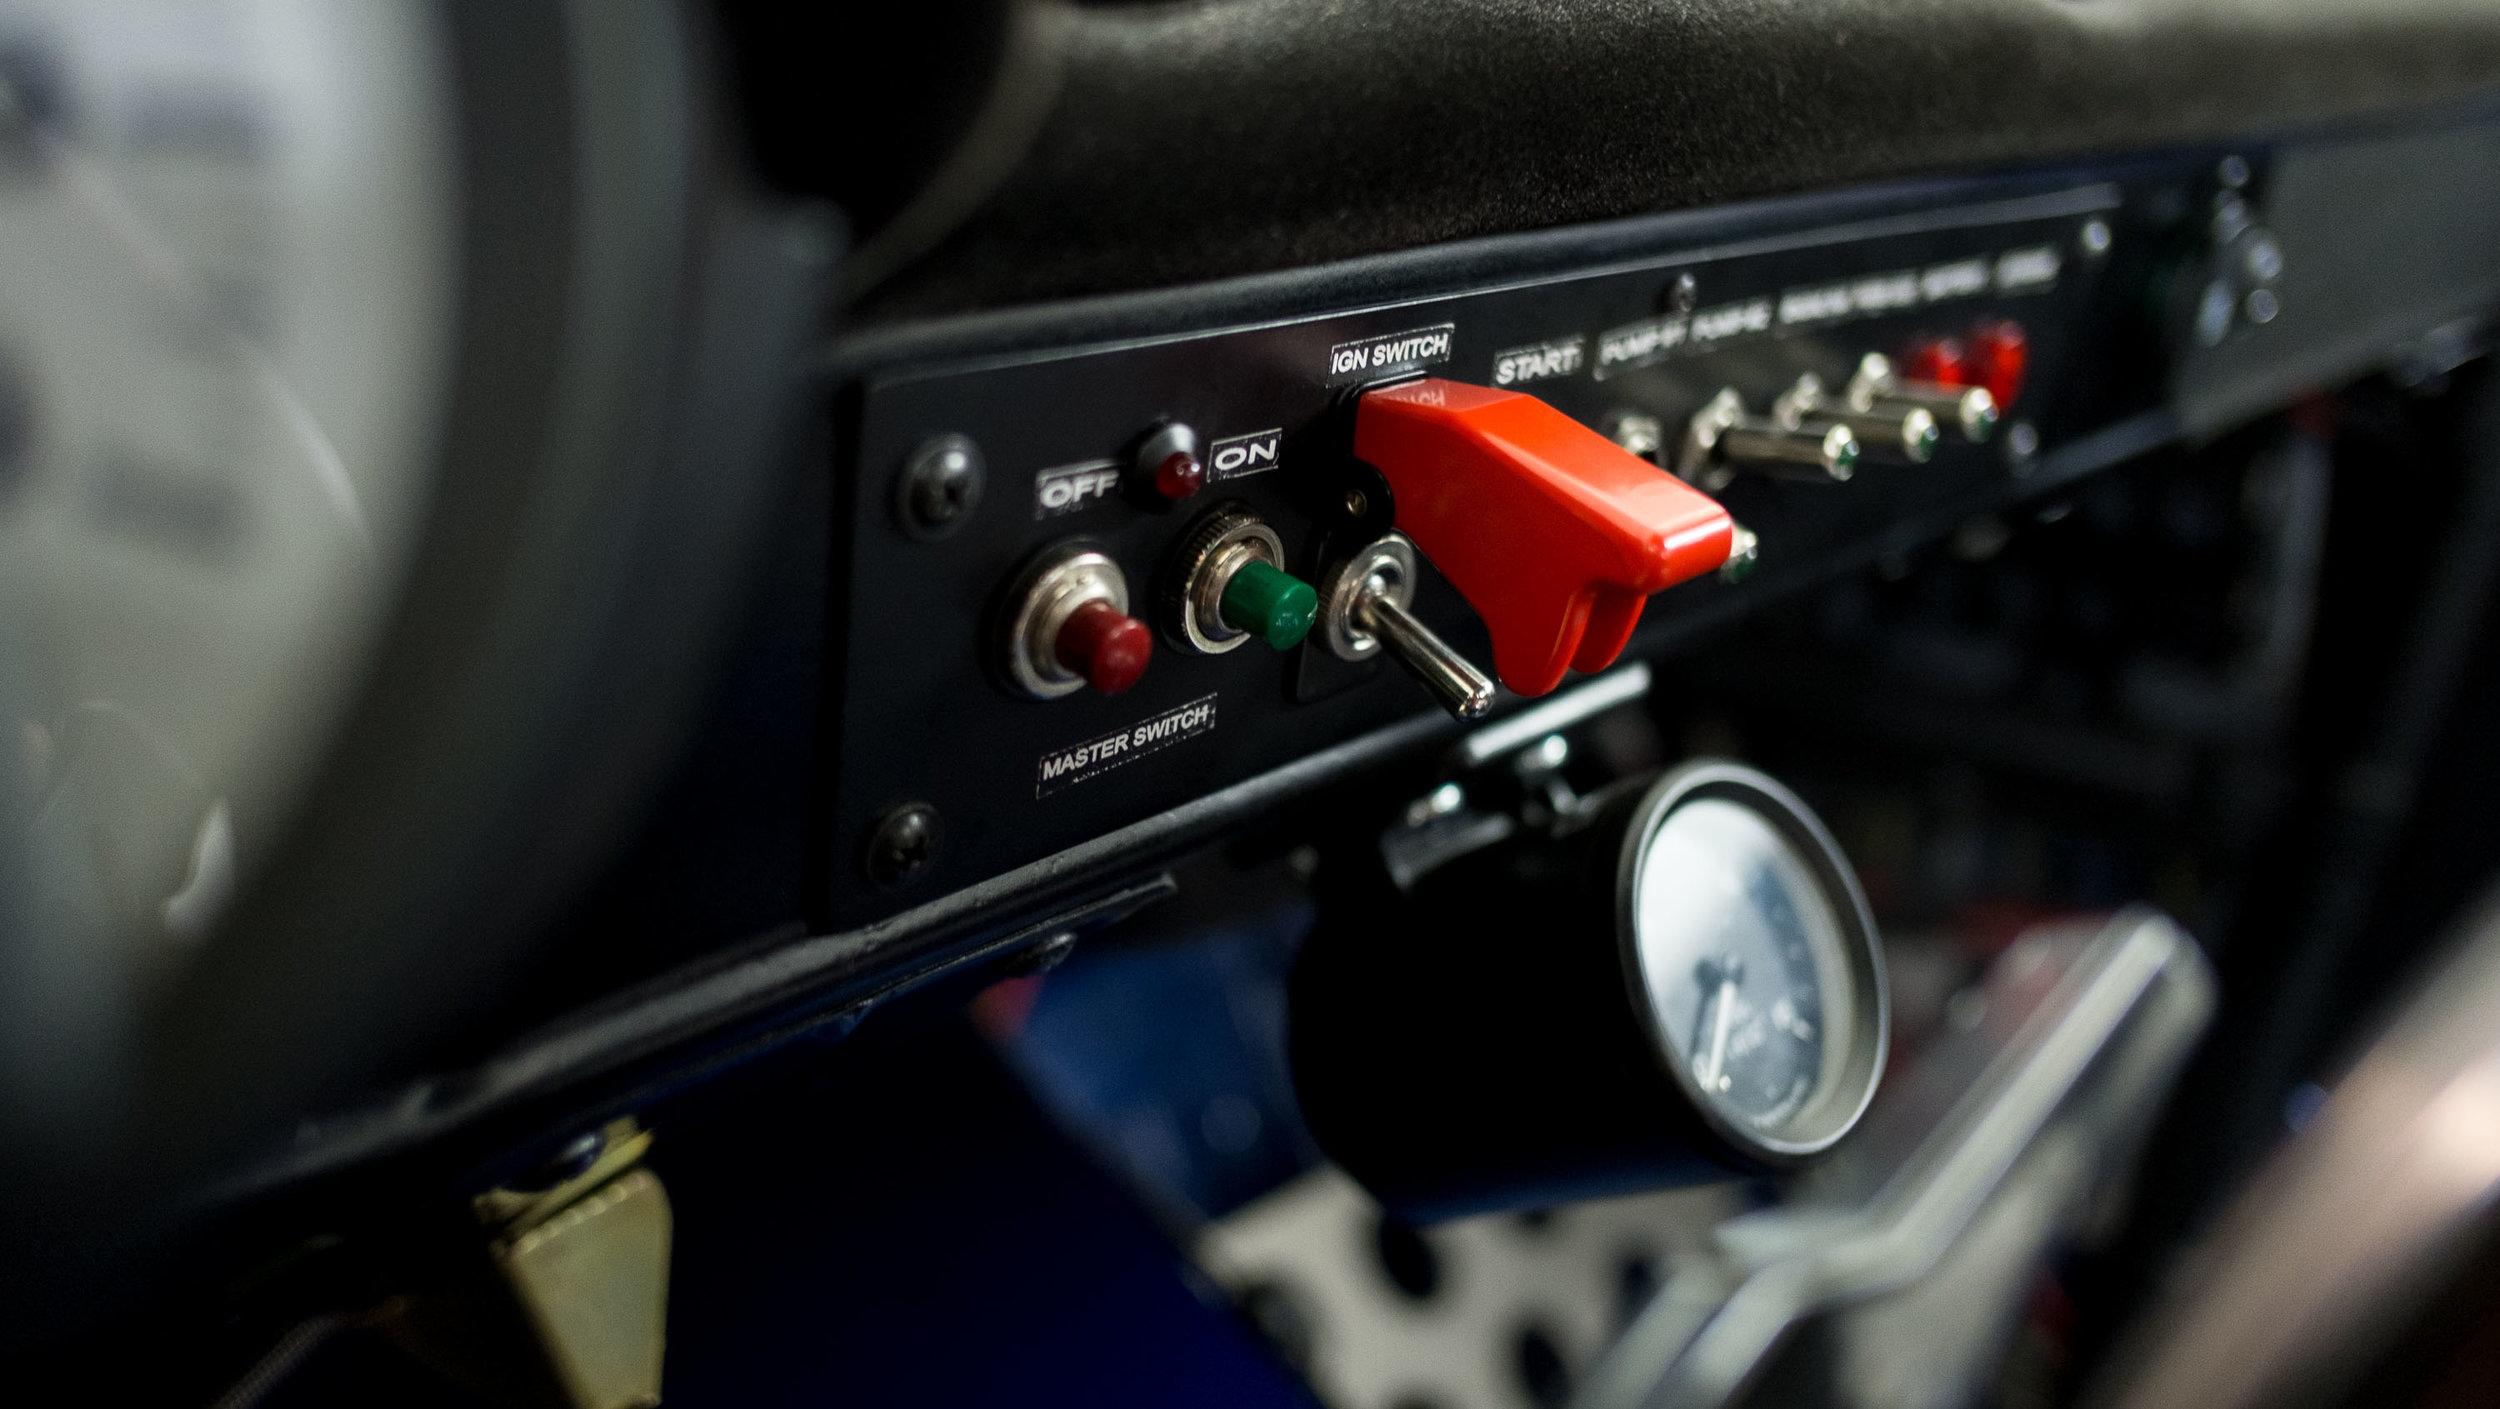 coolnvintage Ford Escort MKI (85 of 87).jpg